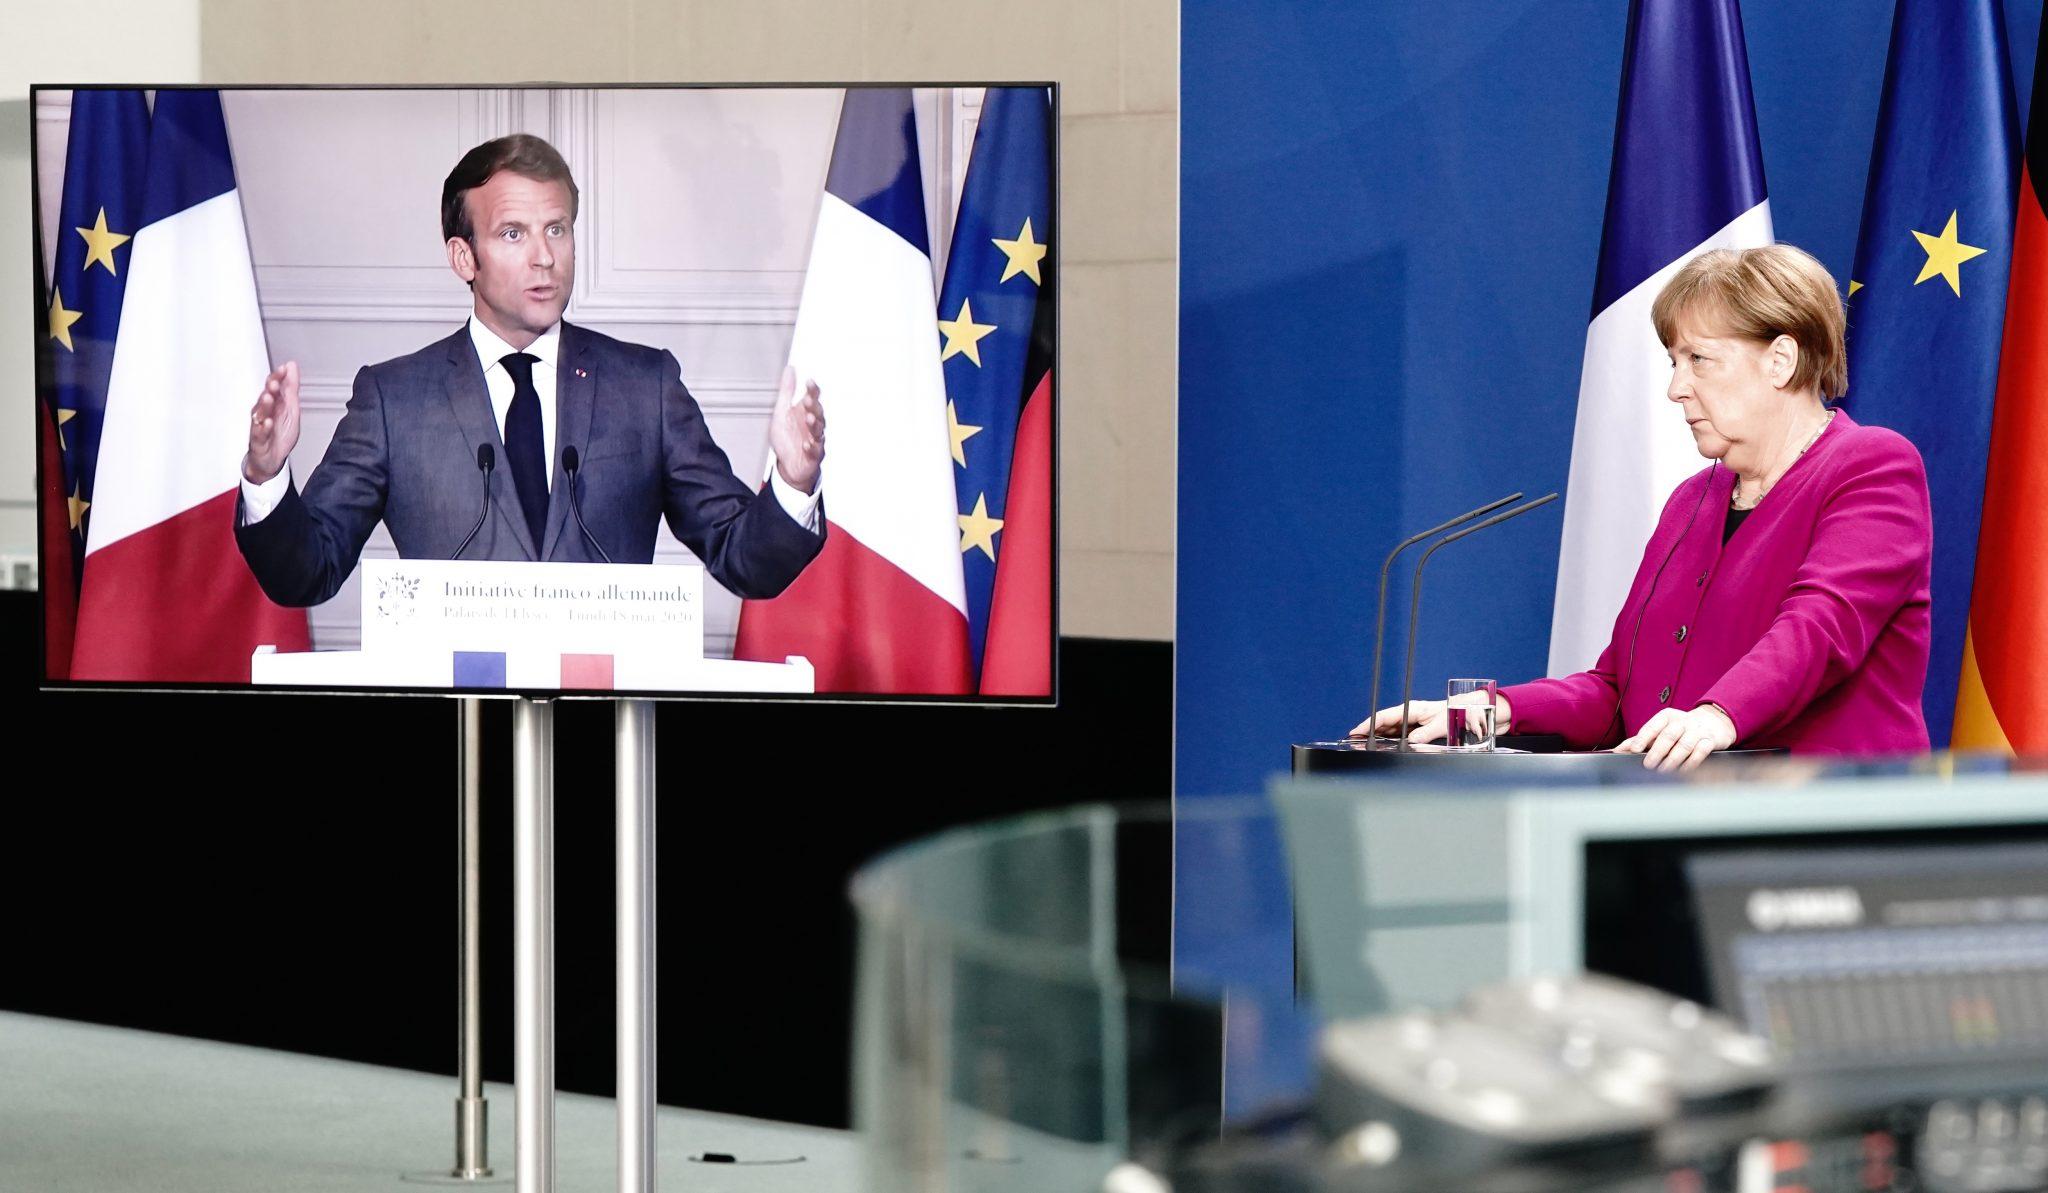 Angela Merkel (CDU) und Emmanuel Macron (En Marche)